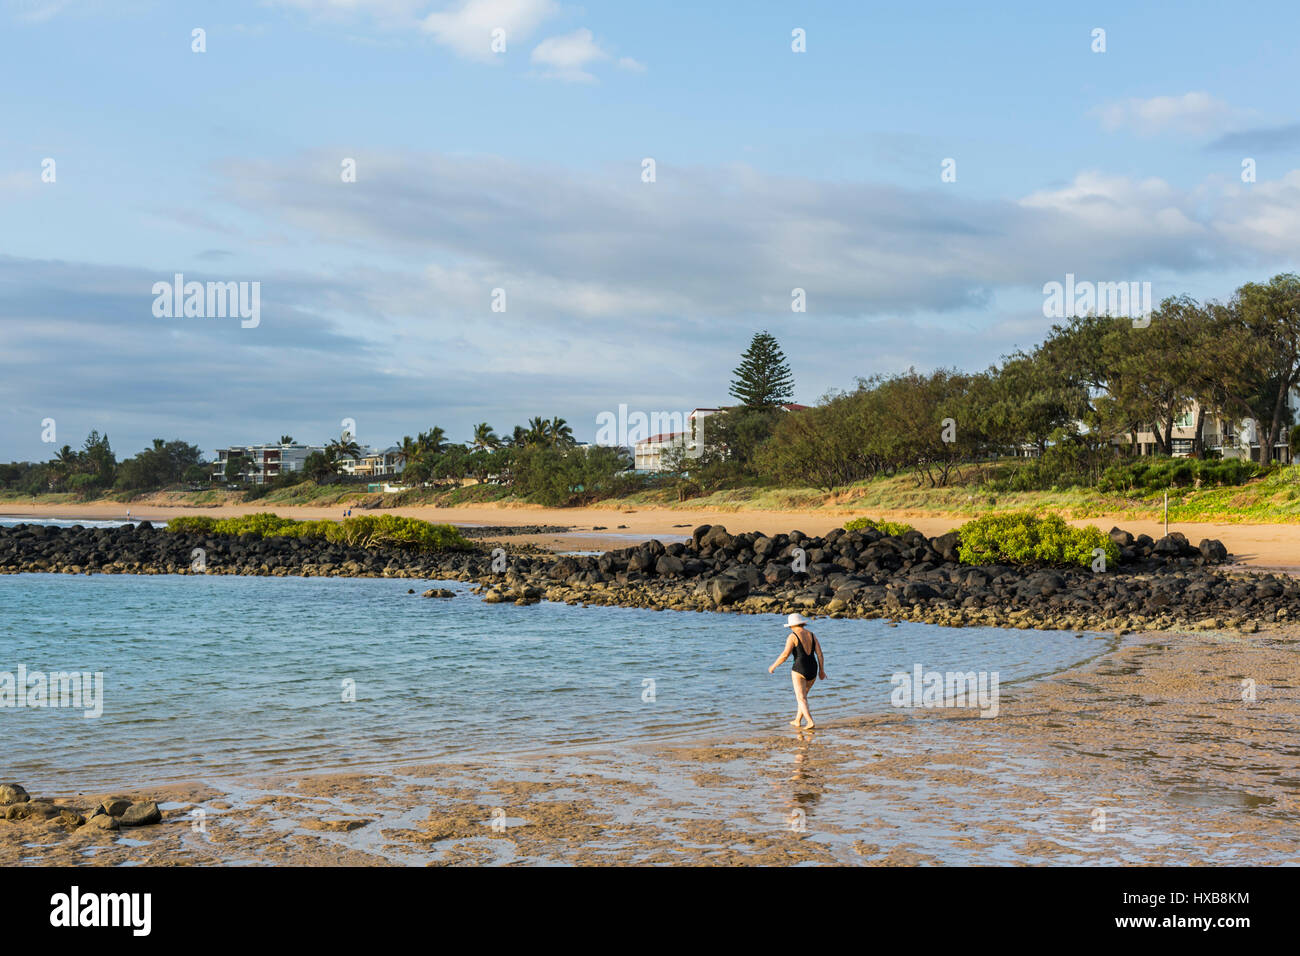 Woman walking into the sea at Bargara Beach, Bundaberg, Queensland, Australia - Stock Image